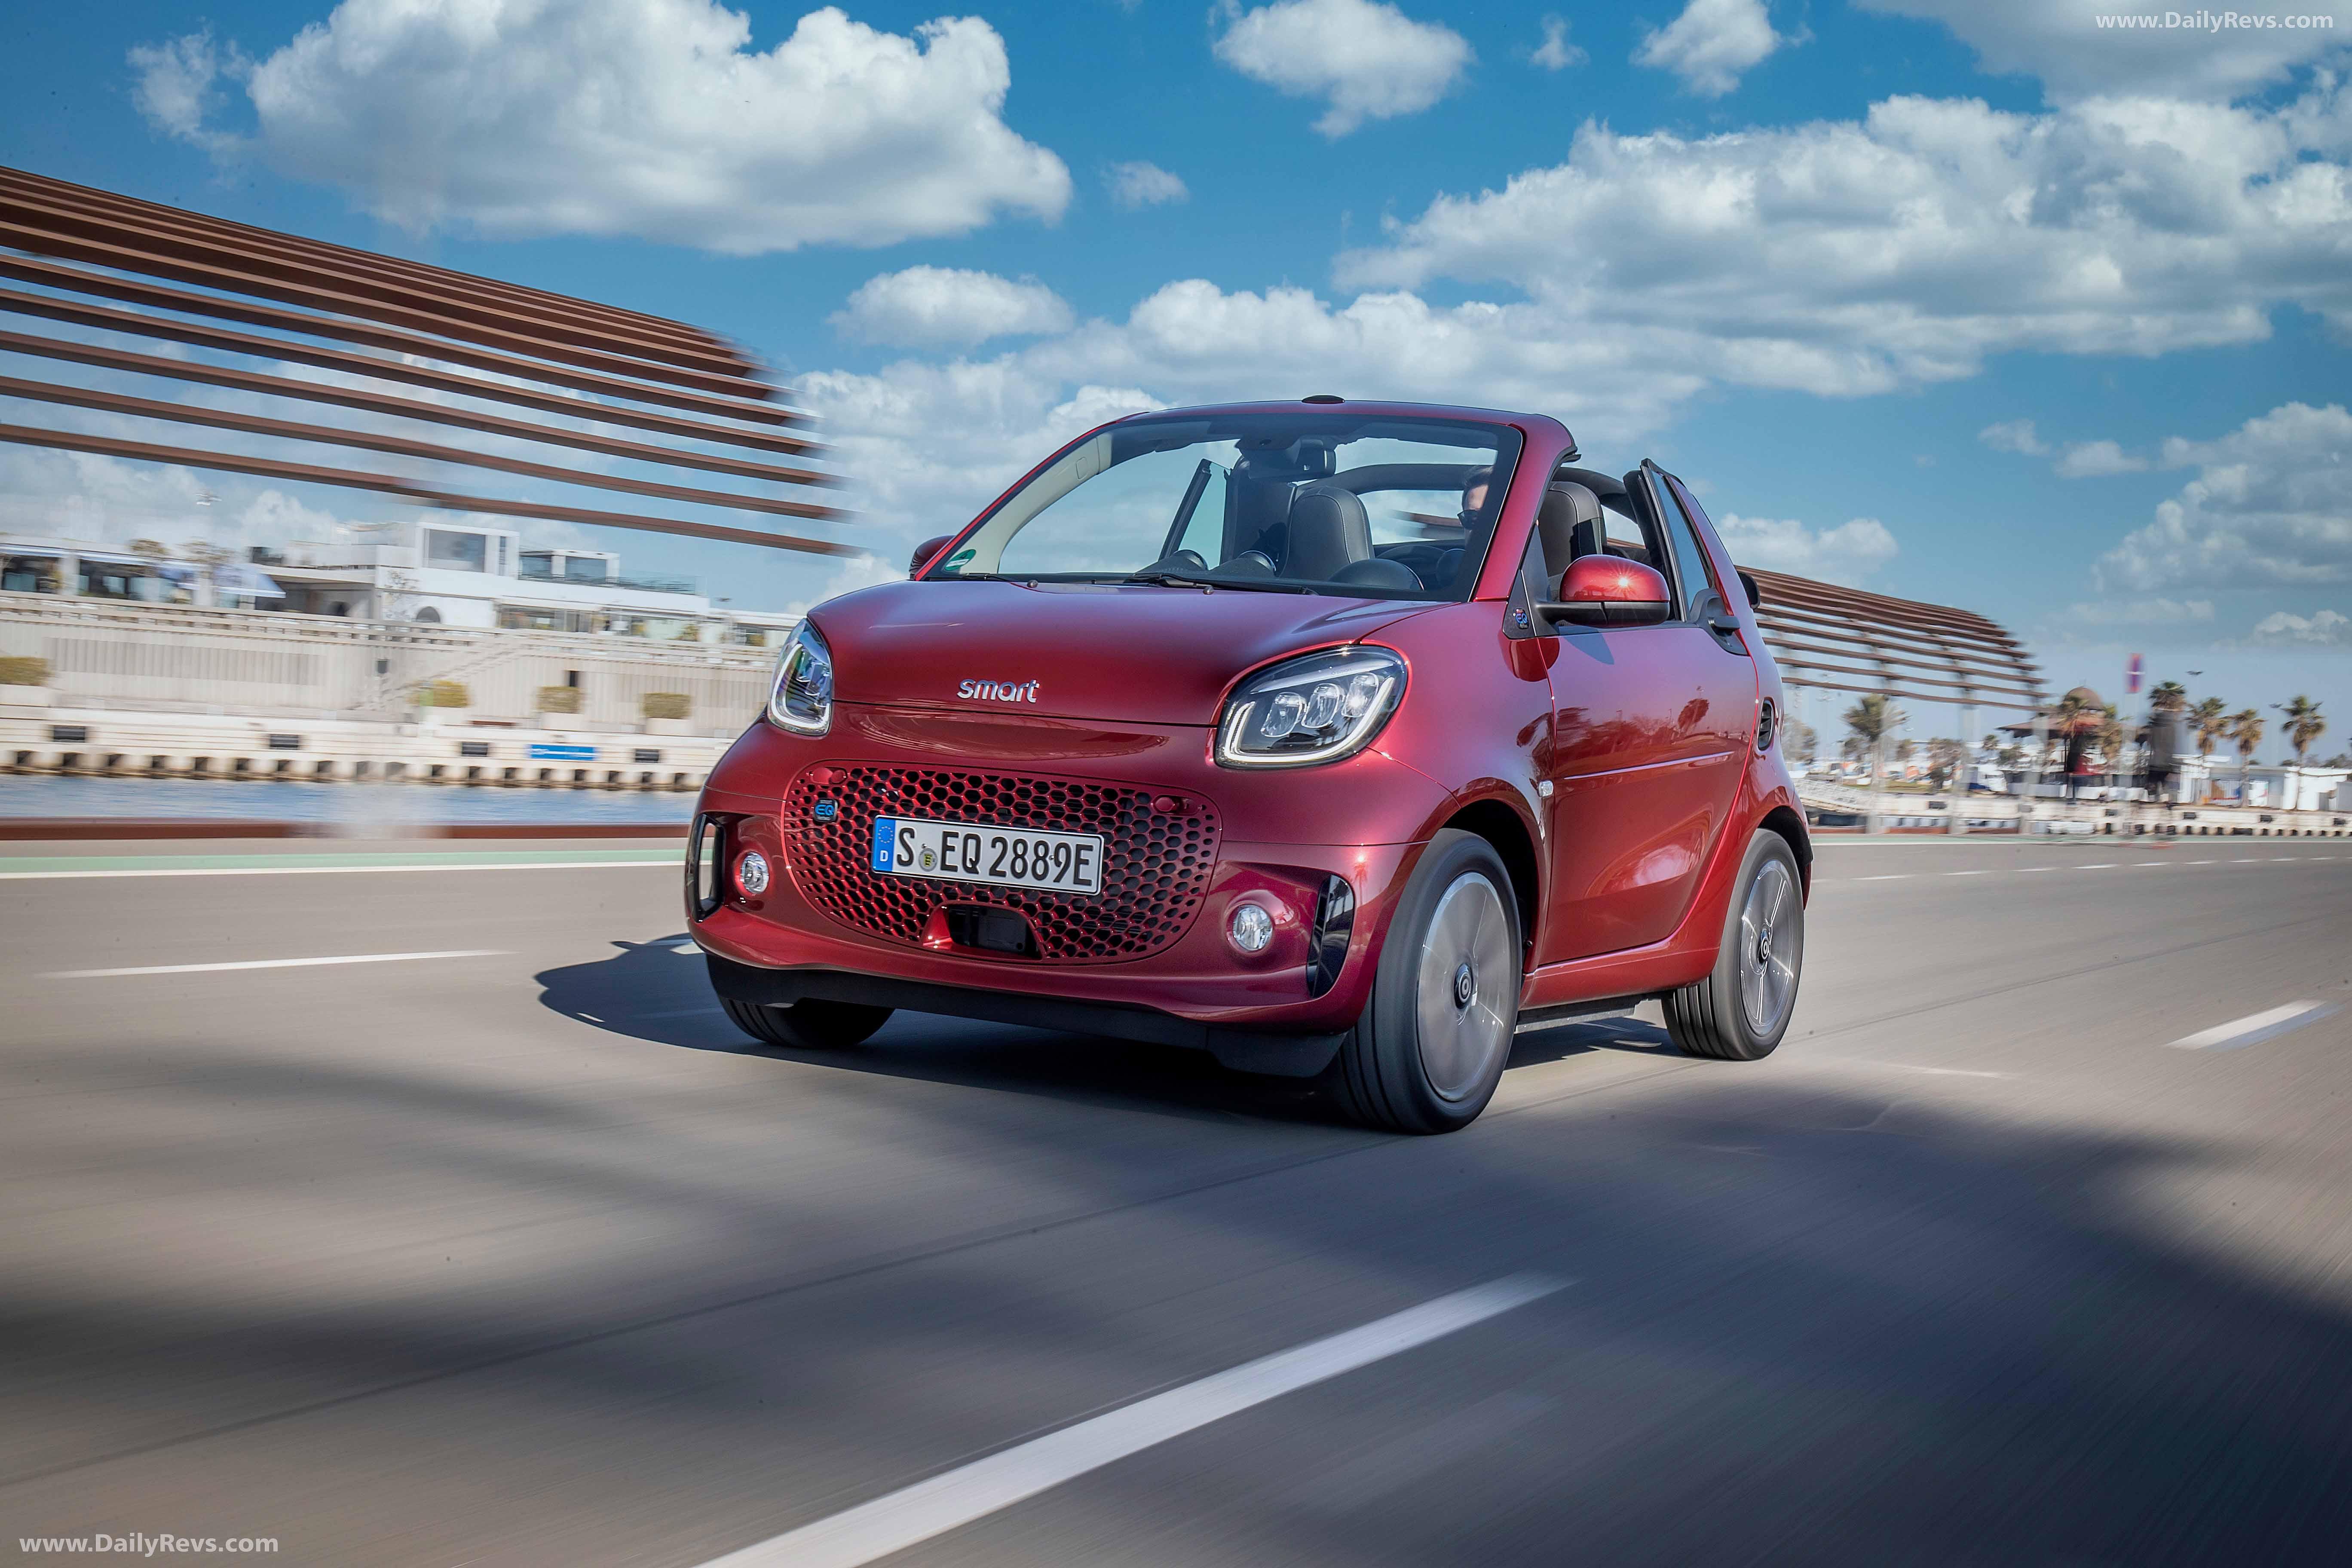 2020 Smart EQ fortwo Cabrio - HD Pictures, Videos, Specs ...